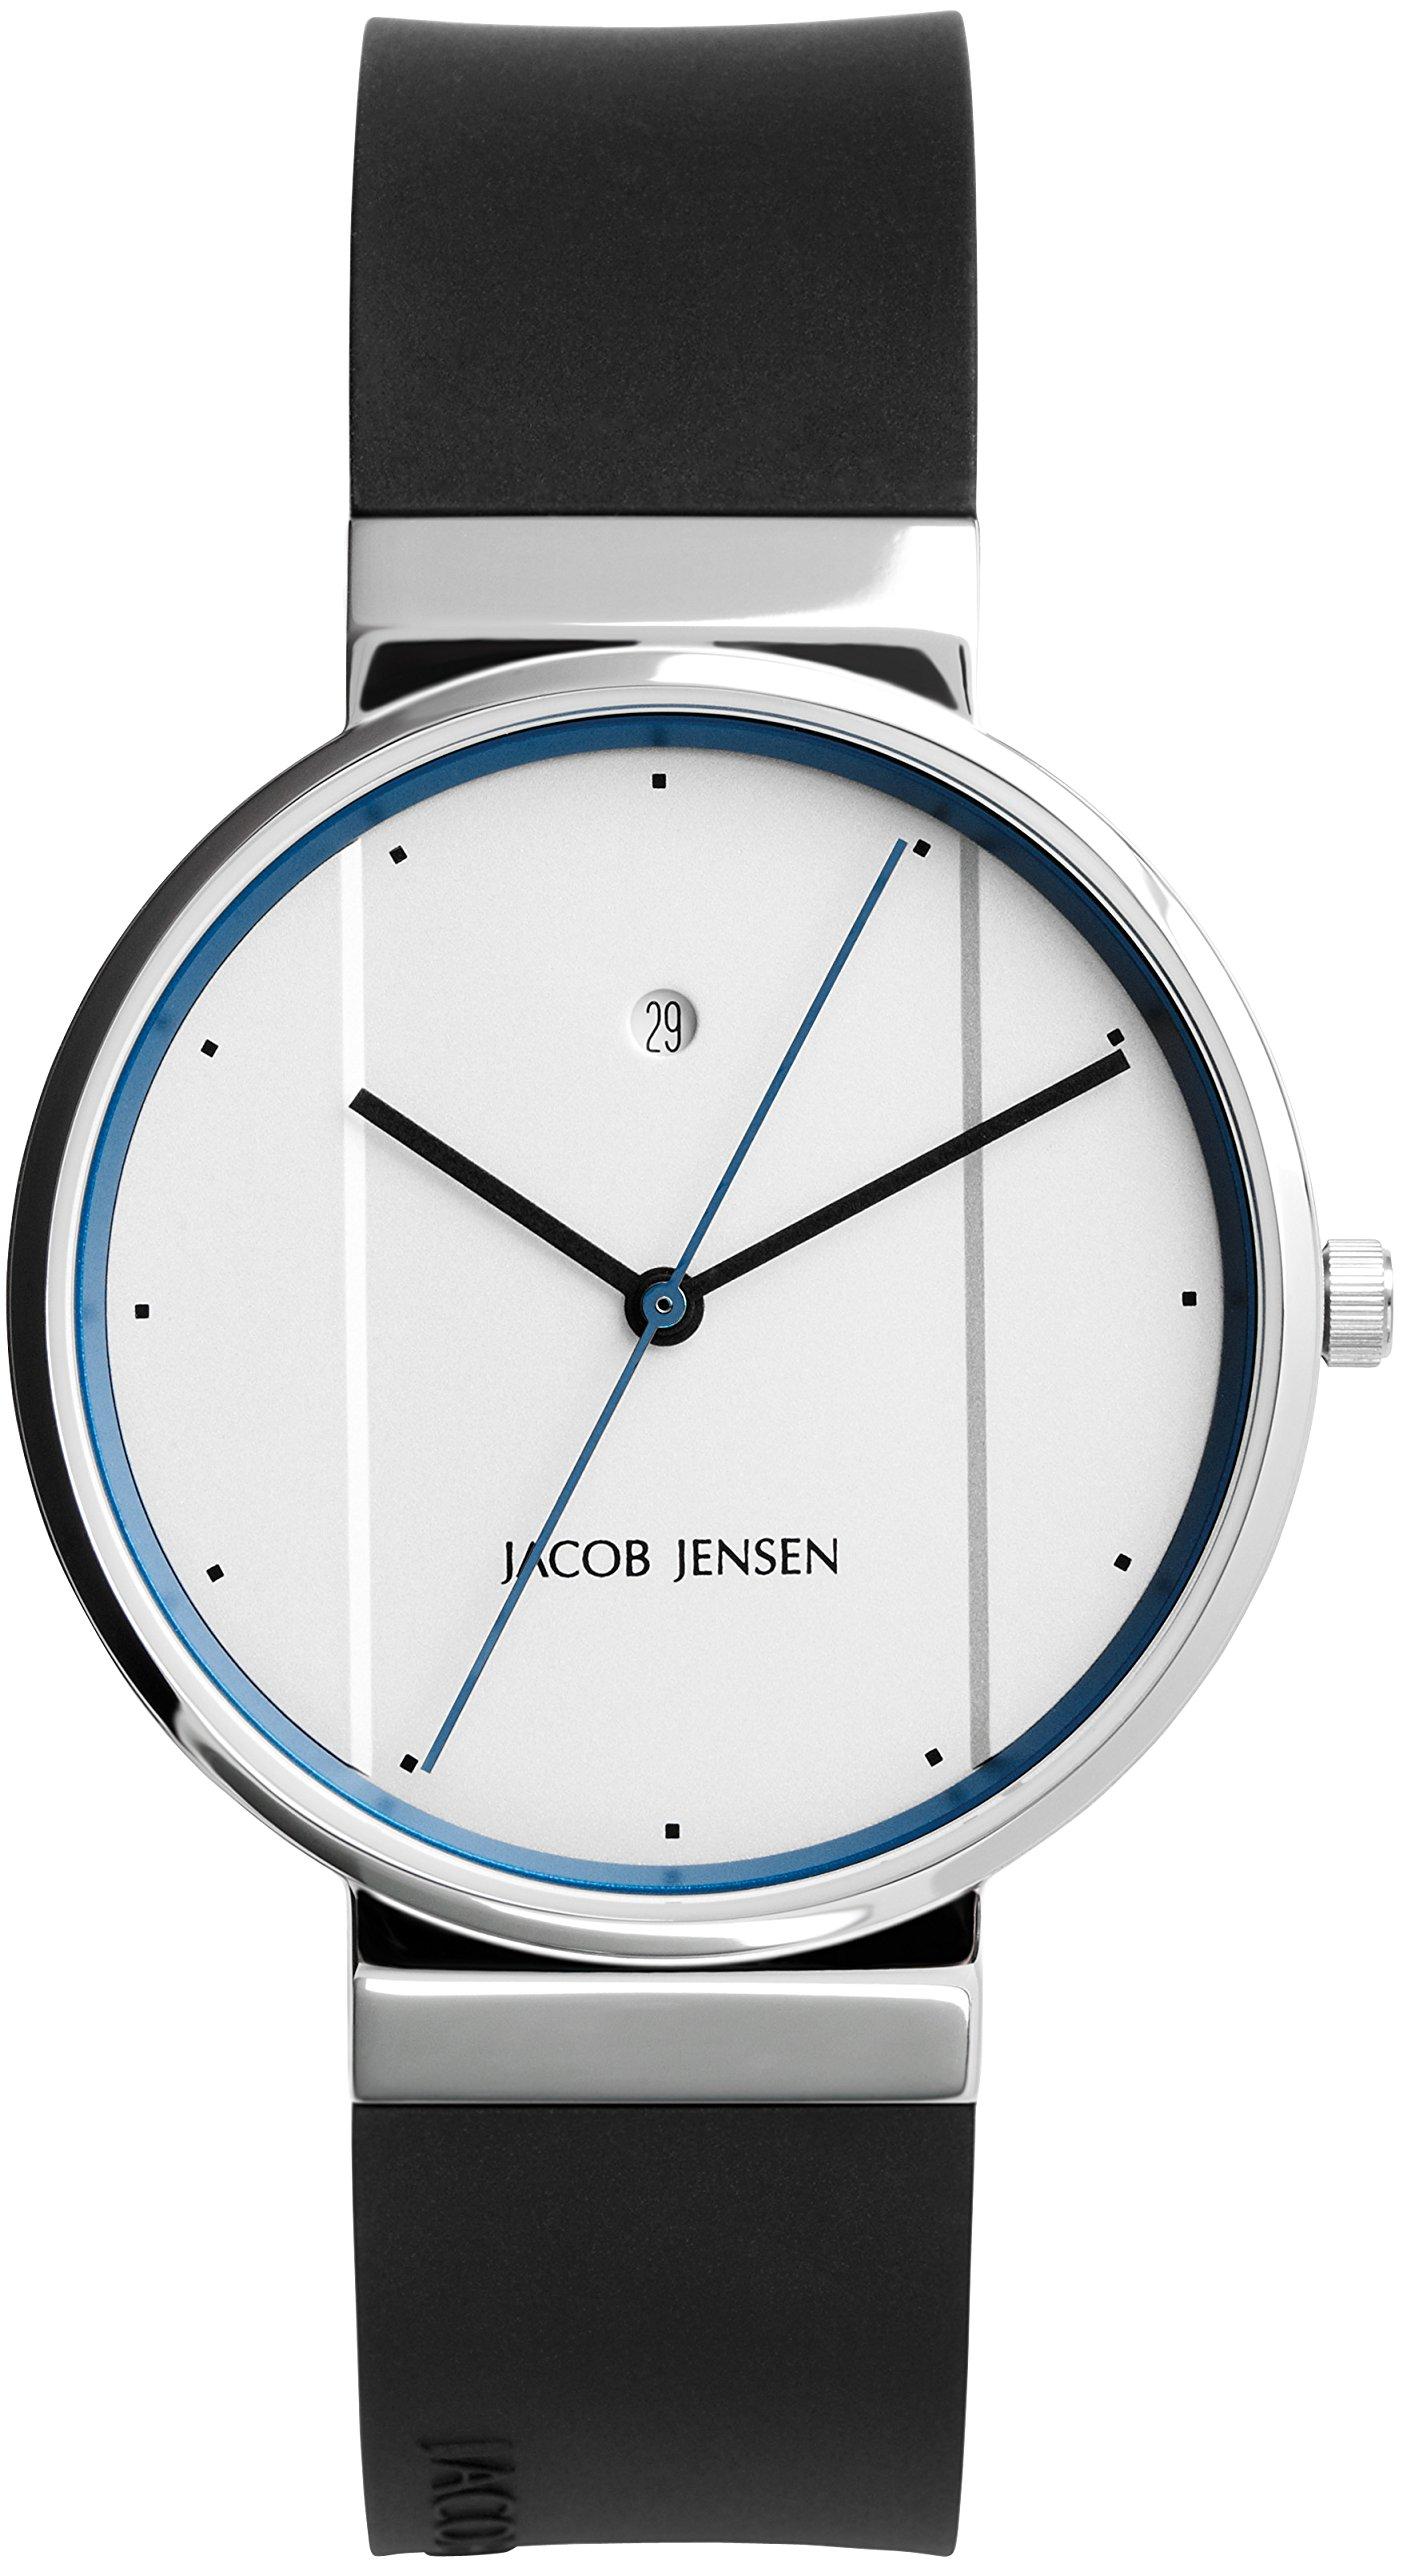 Jacob Jensen Reloj analógico para Unisex de Cuarzo con Correa en Caucho